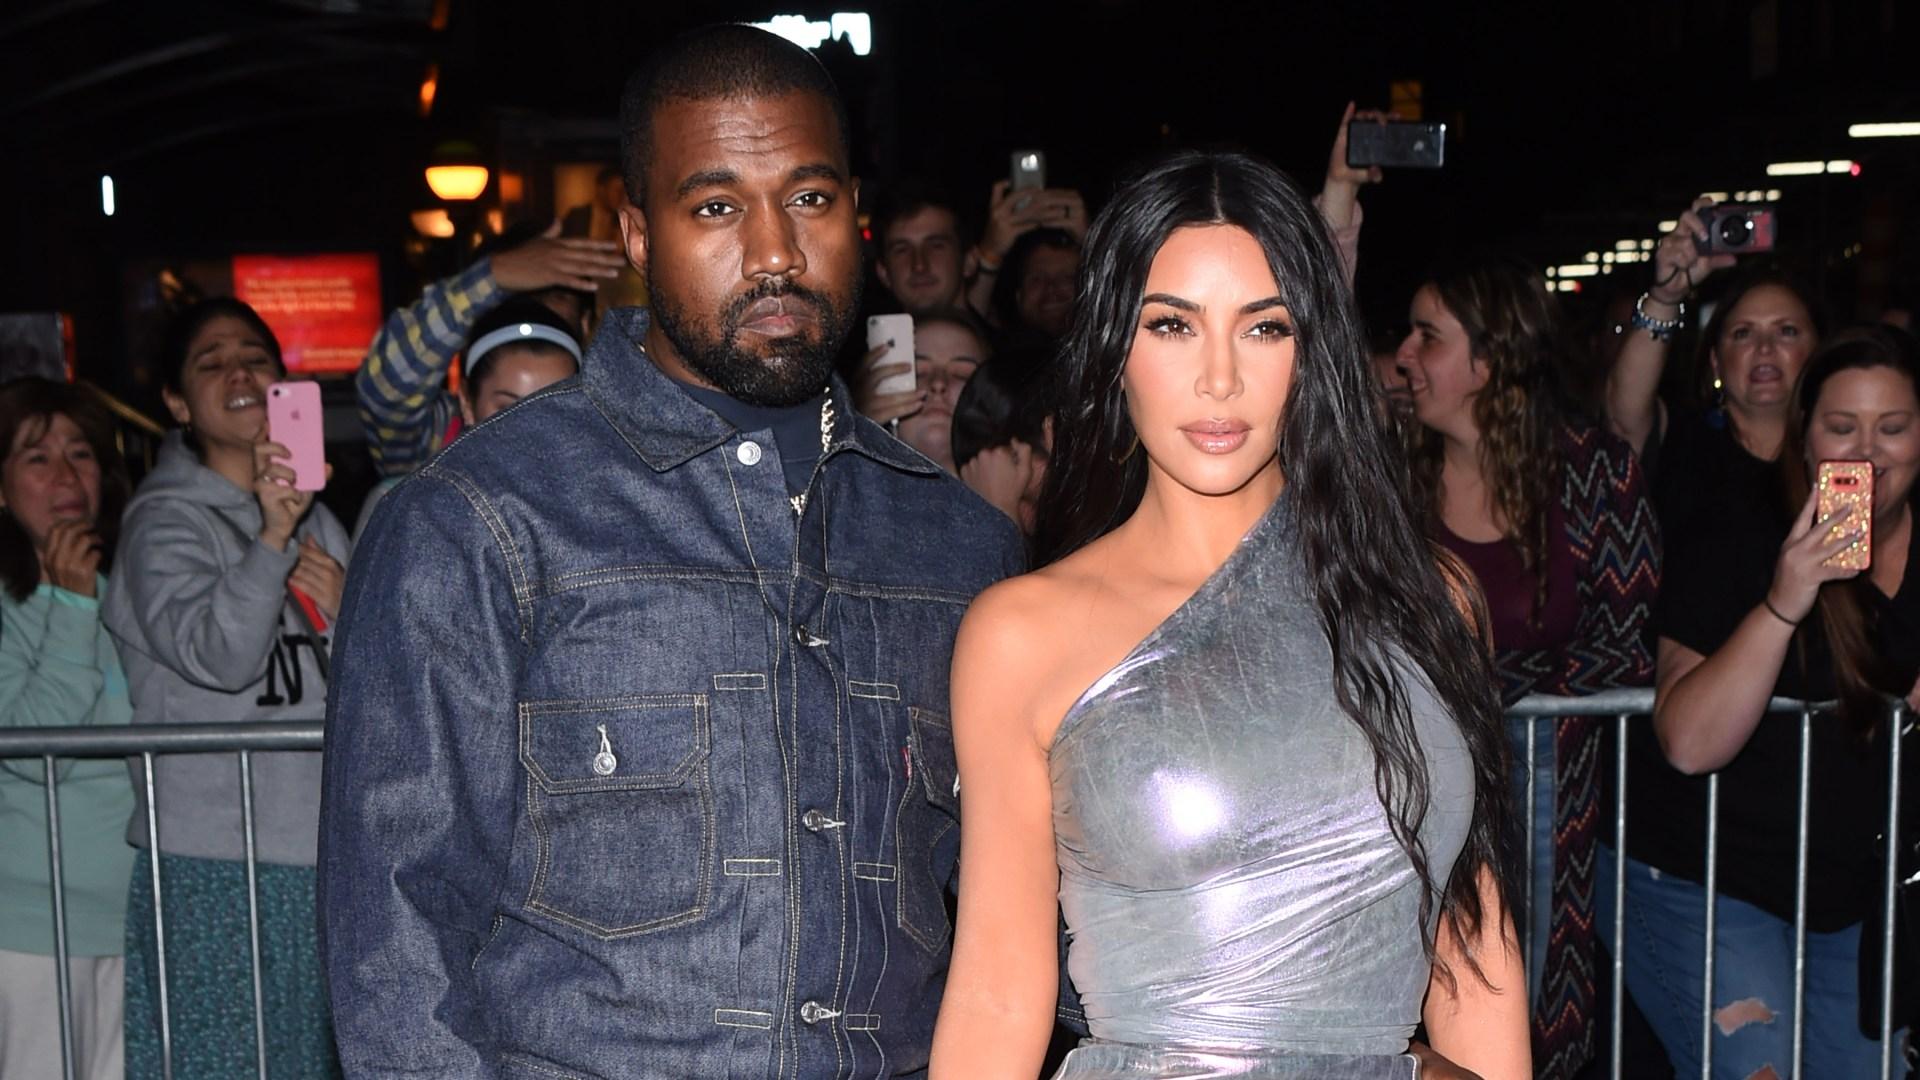 Kim Kardashian Seemingly Took Over Kanye West's Yeezy Showroom Closet Amid Marriage Drama